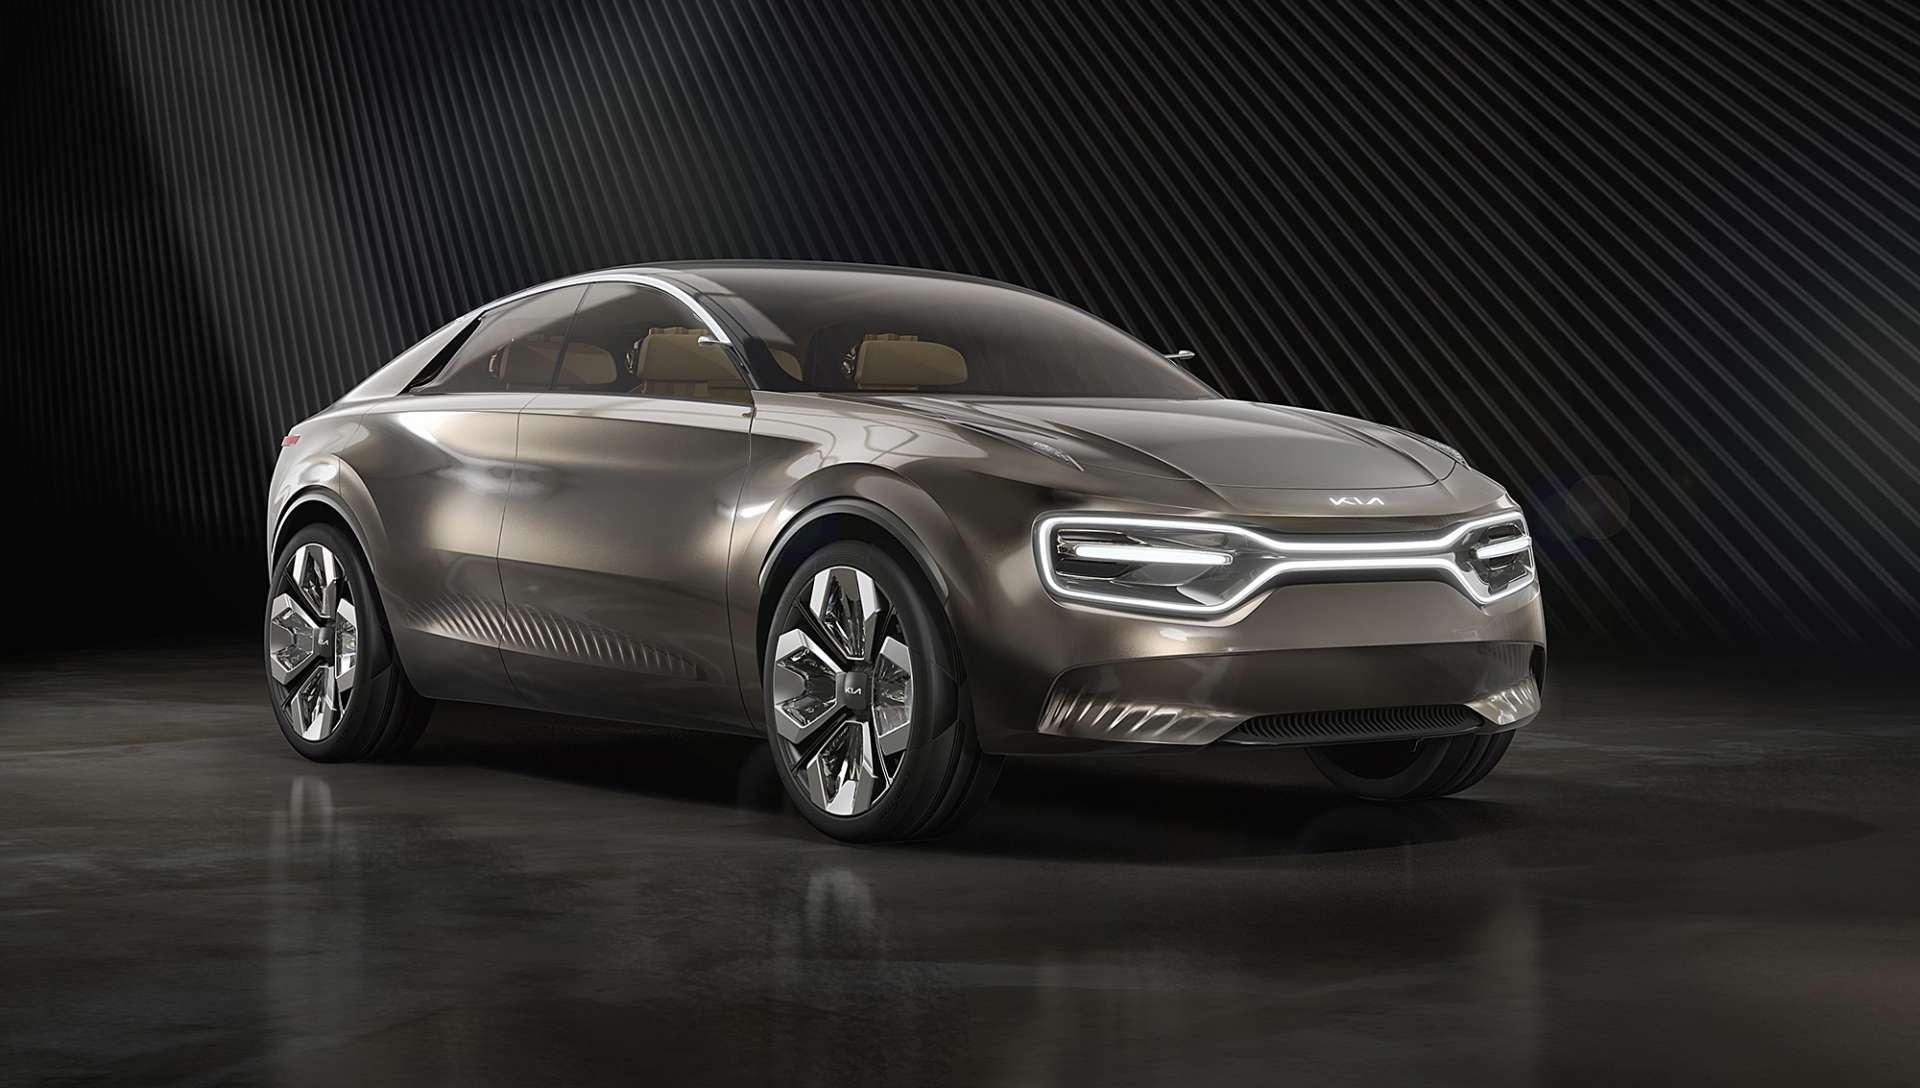 Le concept-car Imagine de Kia sera proposé au grand public en 2021. © Kia Imagine by Kia concept 2019